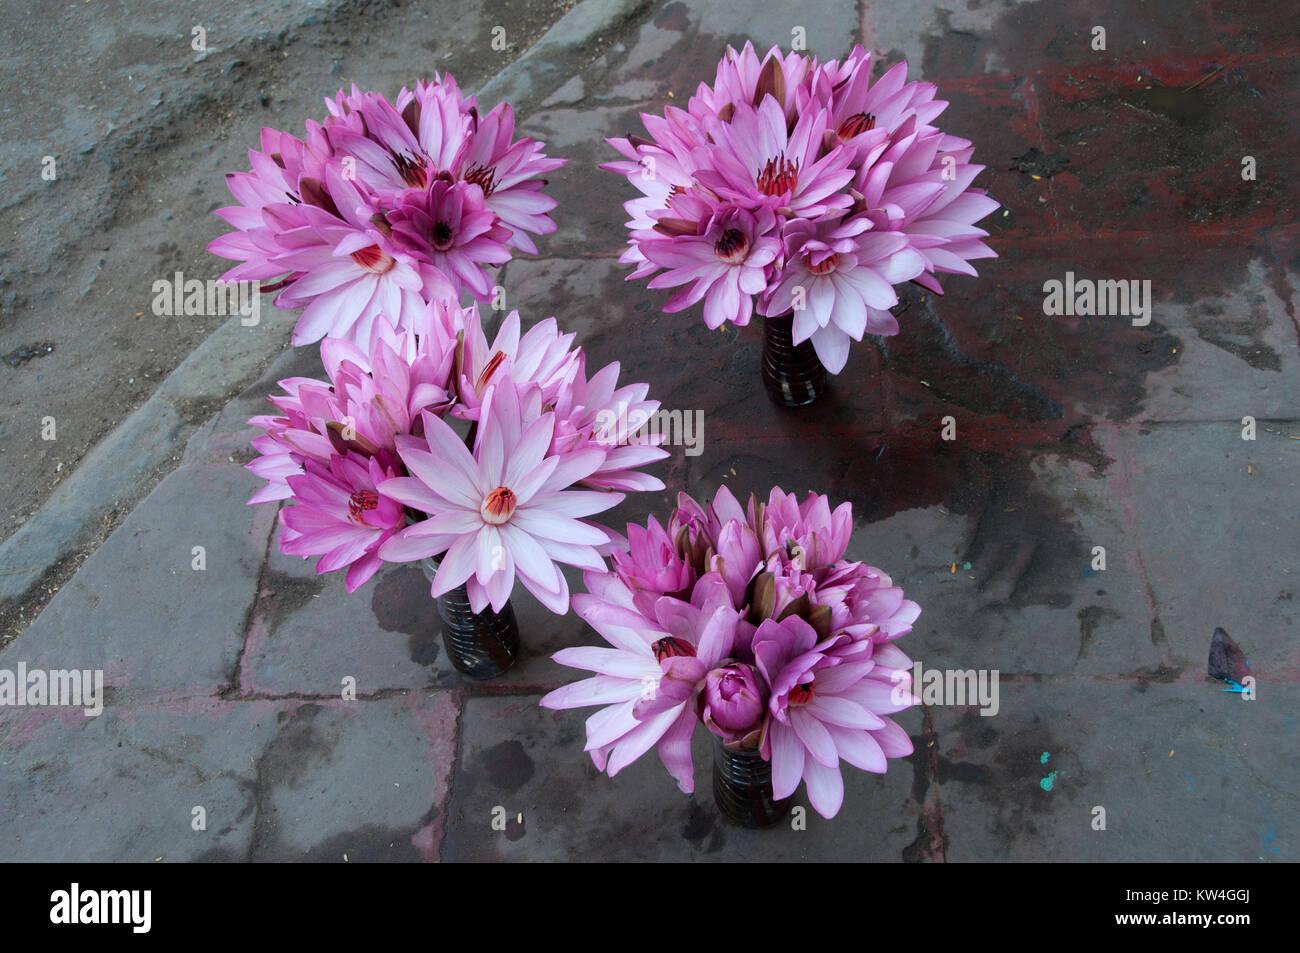 Lotus flowers for sale stock photos lotus flowers for sale stock bodhgaya the town where the buddha sat under a sacred fig tree izmirmasajfo